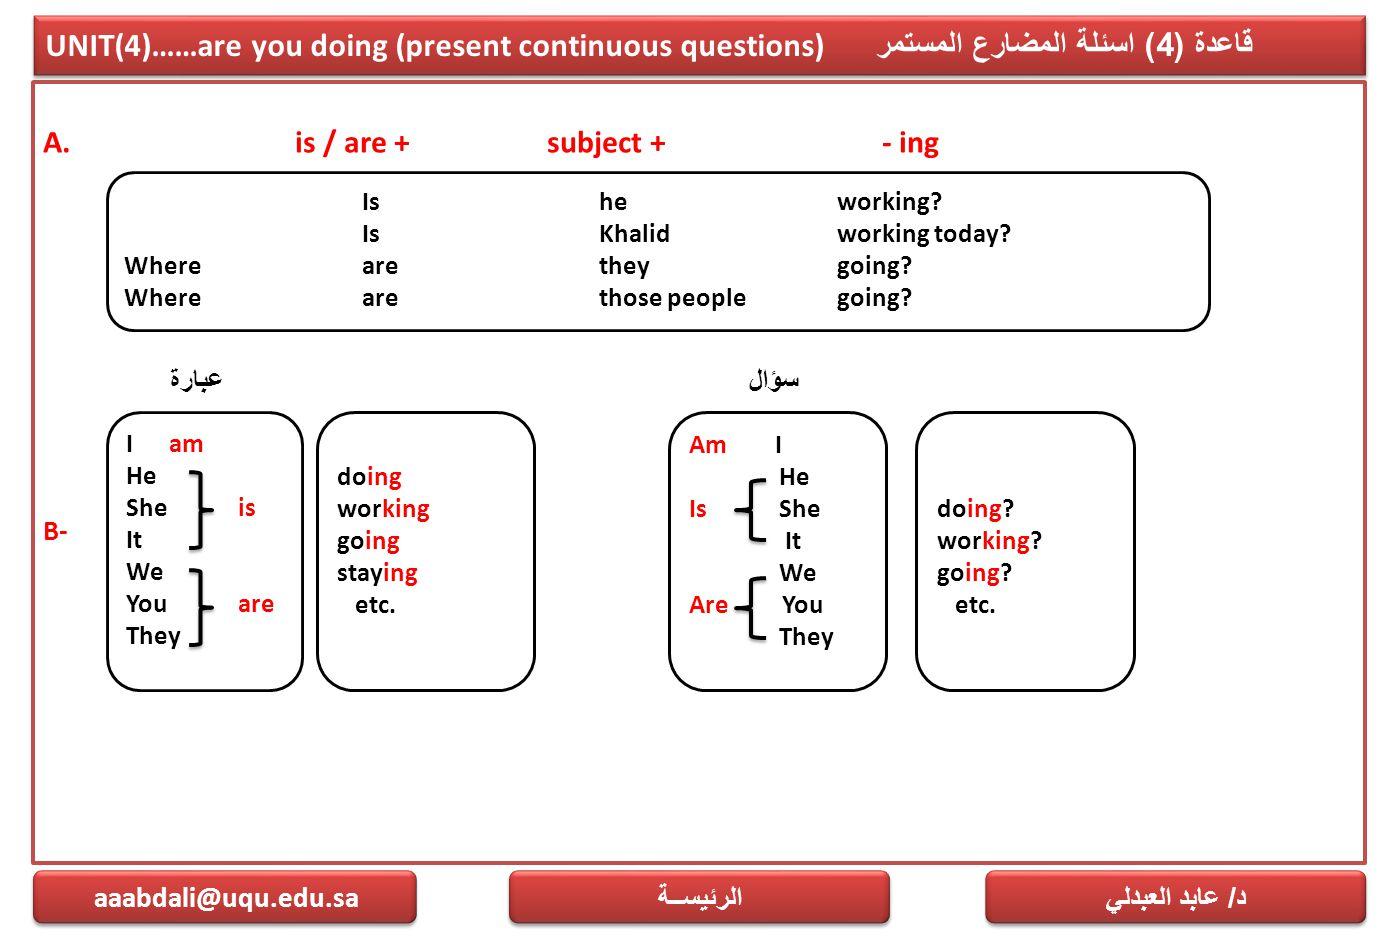 UNIT(4)……are you doing (present continuous questions) قاعدة (4) اسئلة المضارع المستمر A. is / are + subject + - ing B- د / عابد العبدلي aaabdali@uqu.e